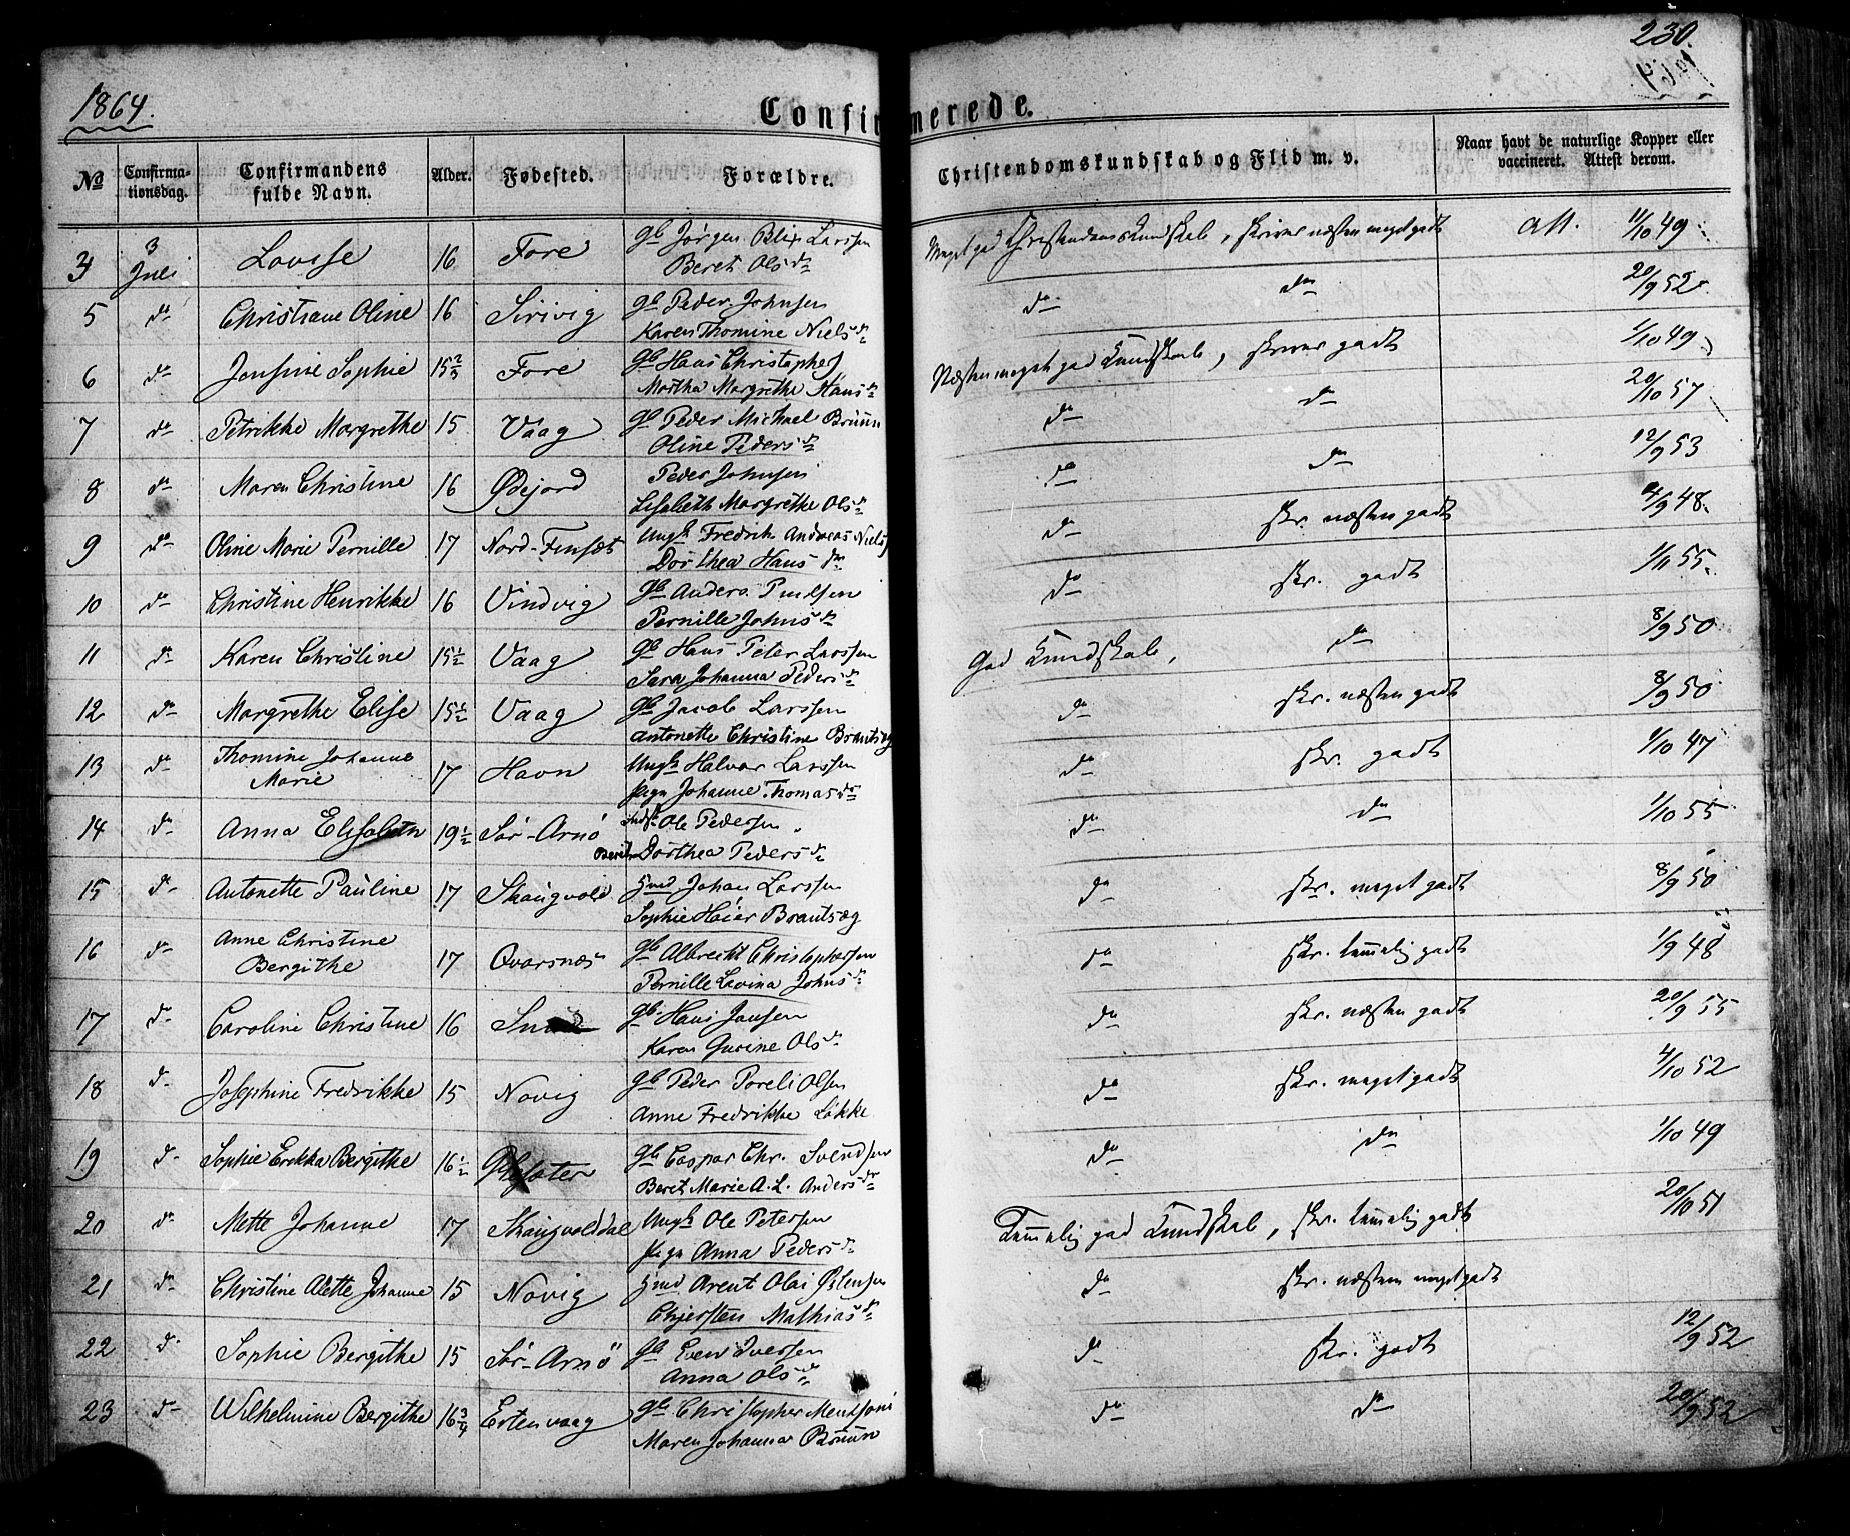 SAT, Ministerialprotokoller, klokkerbøker og fødselsregistre - Nordland, 805/L0098: Ministerialbok nr. 805A05, 1862-1879, s. 230